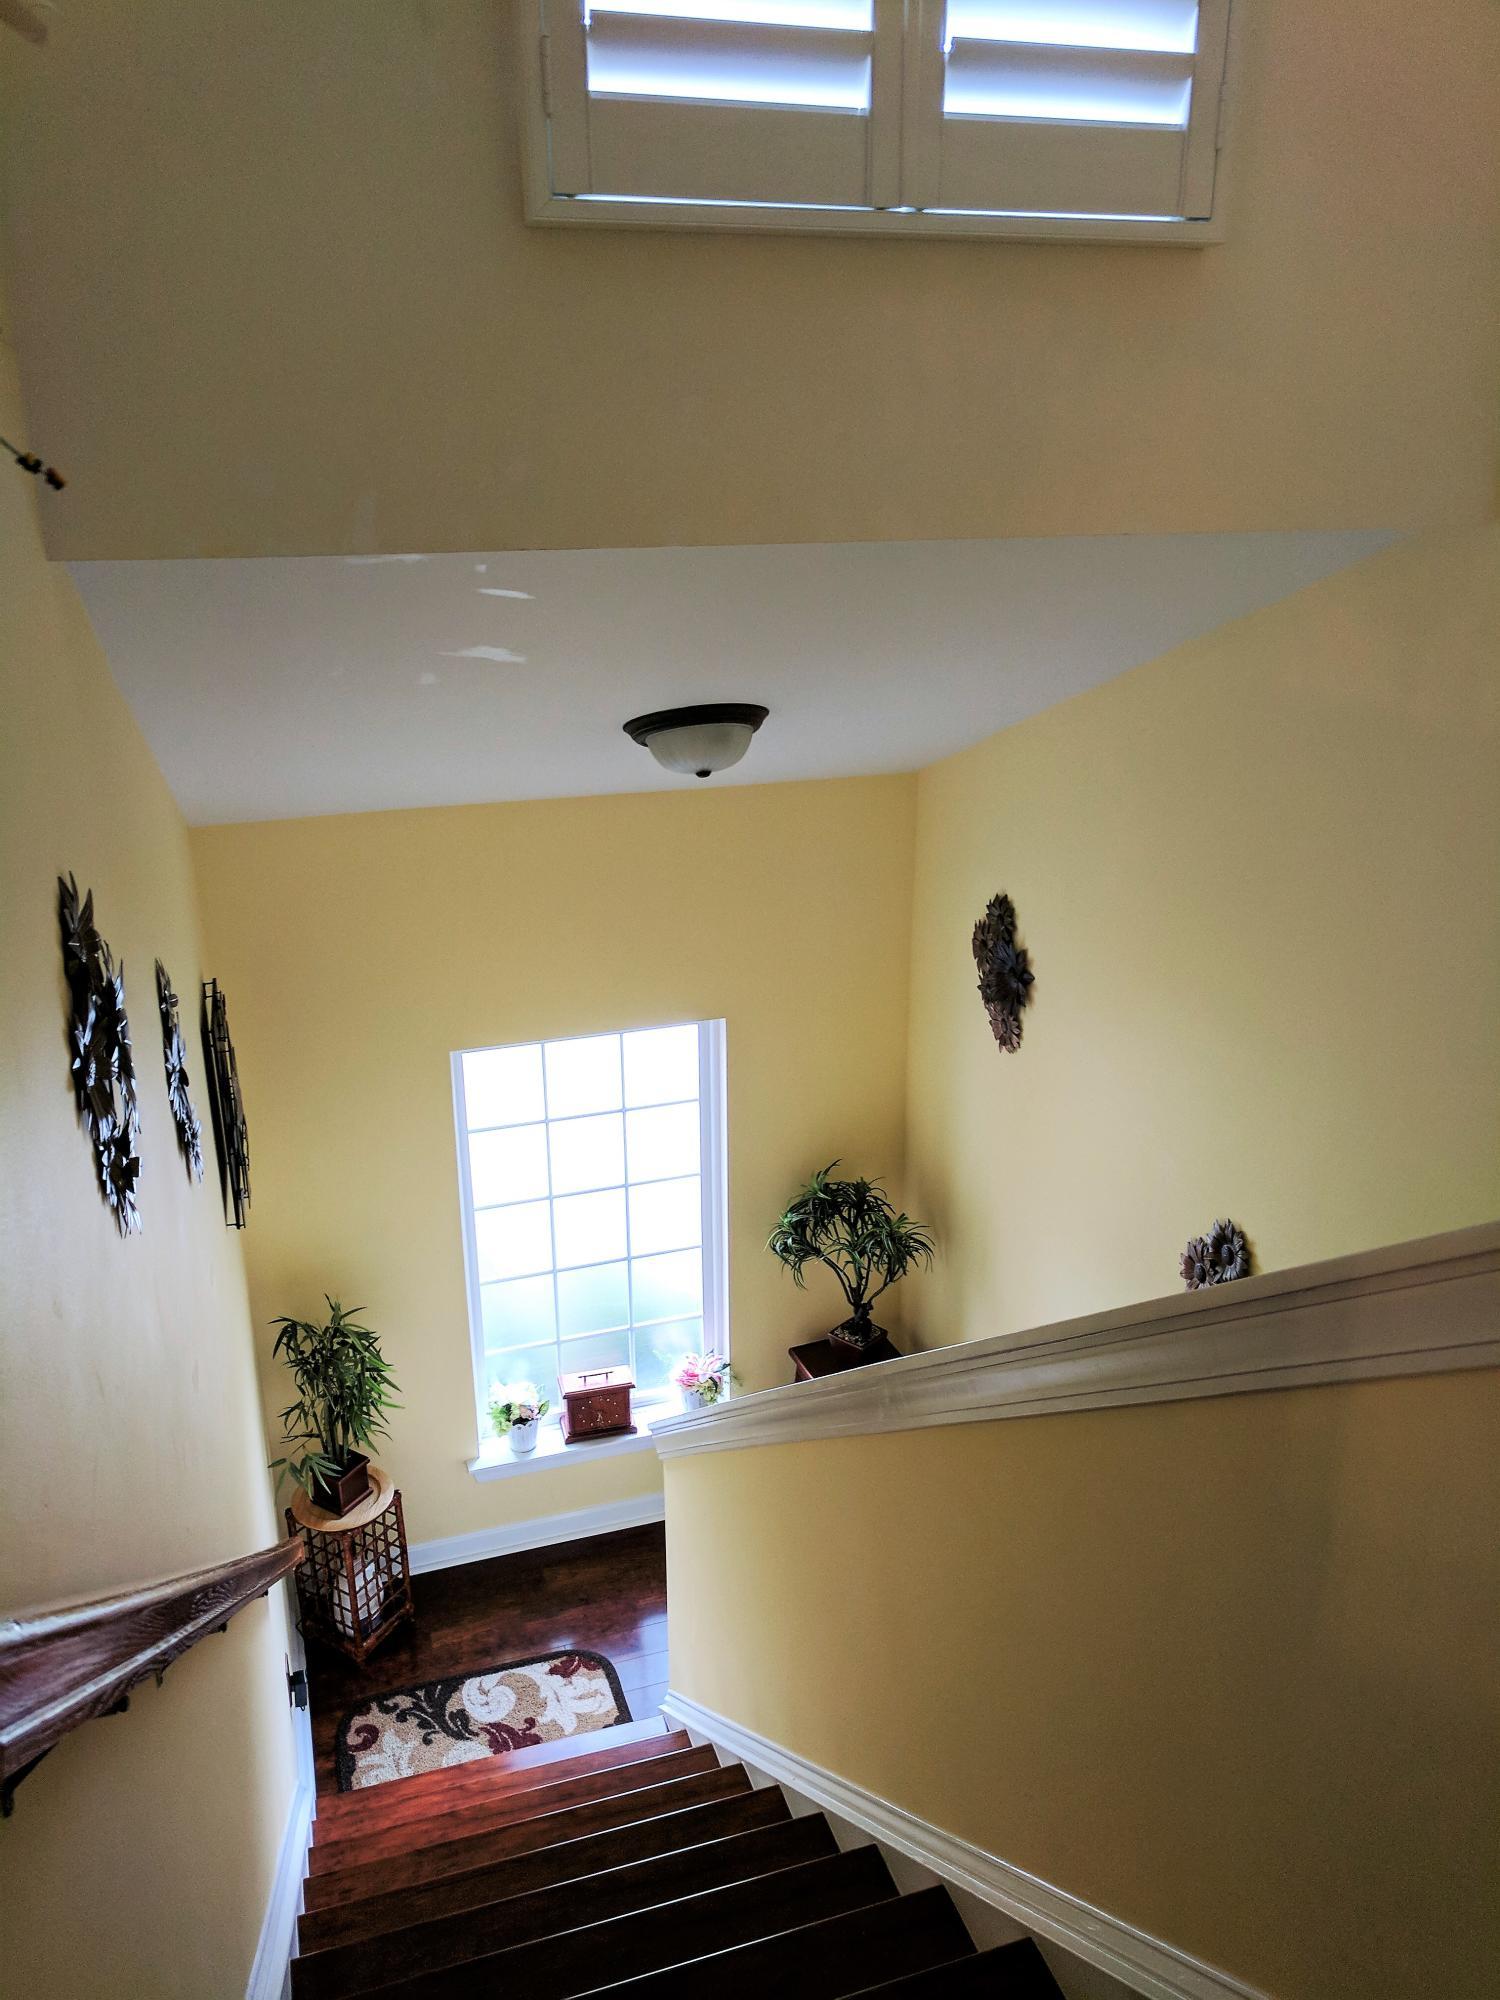 Dunes West Homes For Sale - 1362 Kingsford, Mount Pleasant, SC - 5